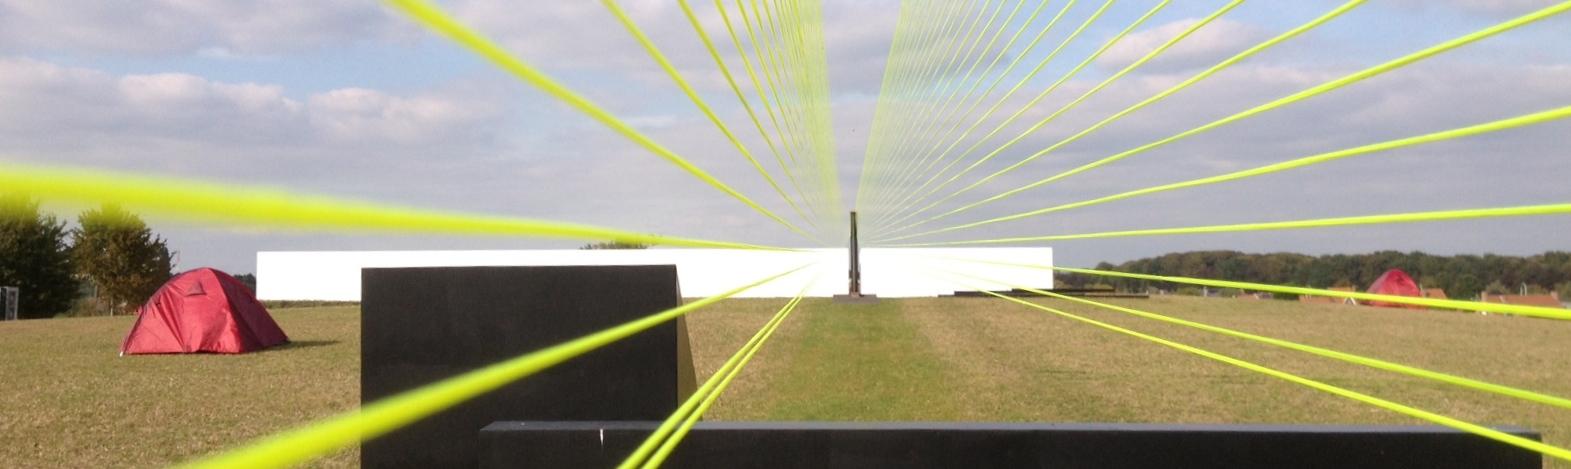 "2. ""floating light green line"", installation 'in situ' lumineuse et auditive (par le vent) par willy cauwelier #be"